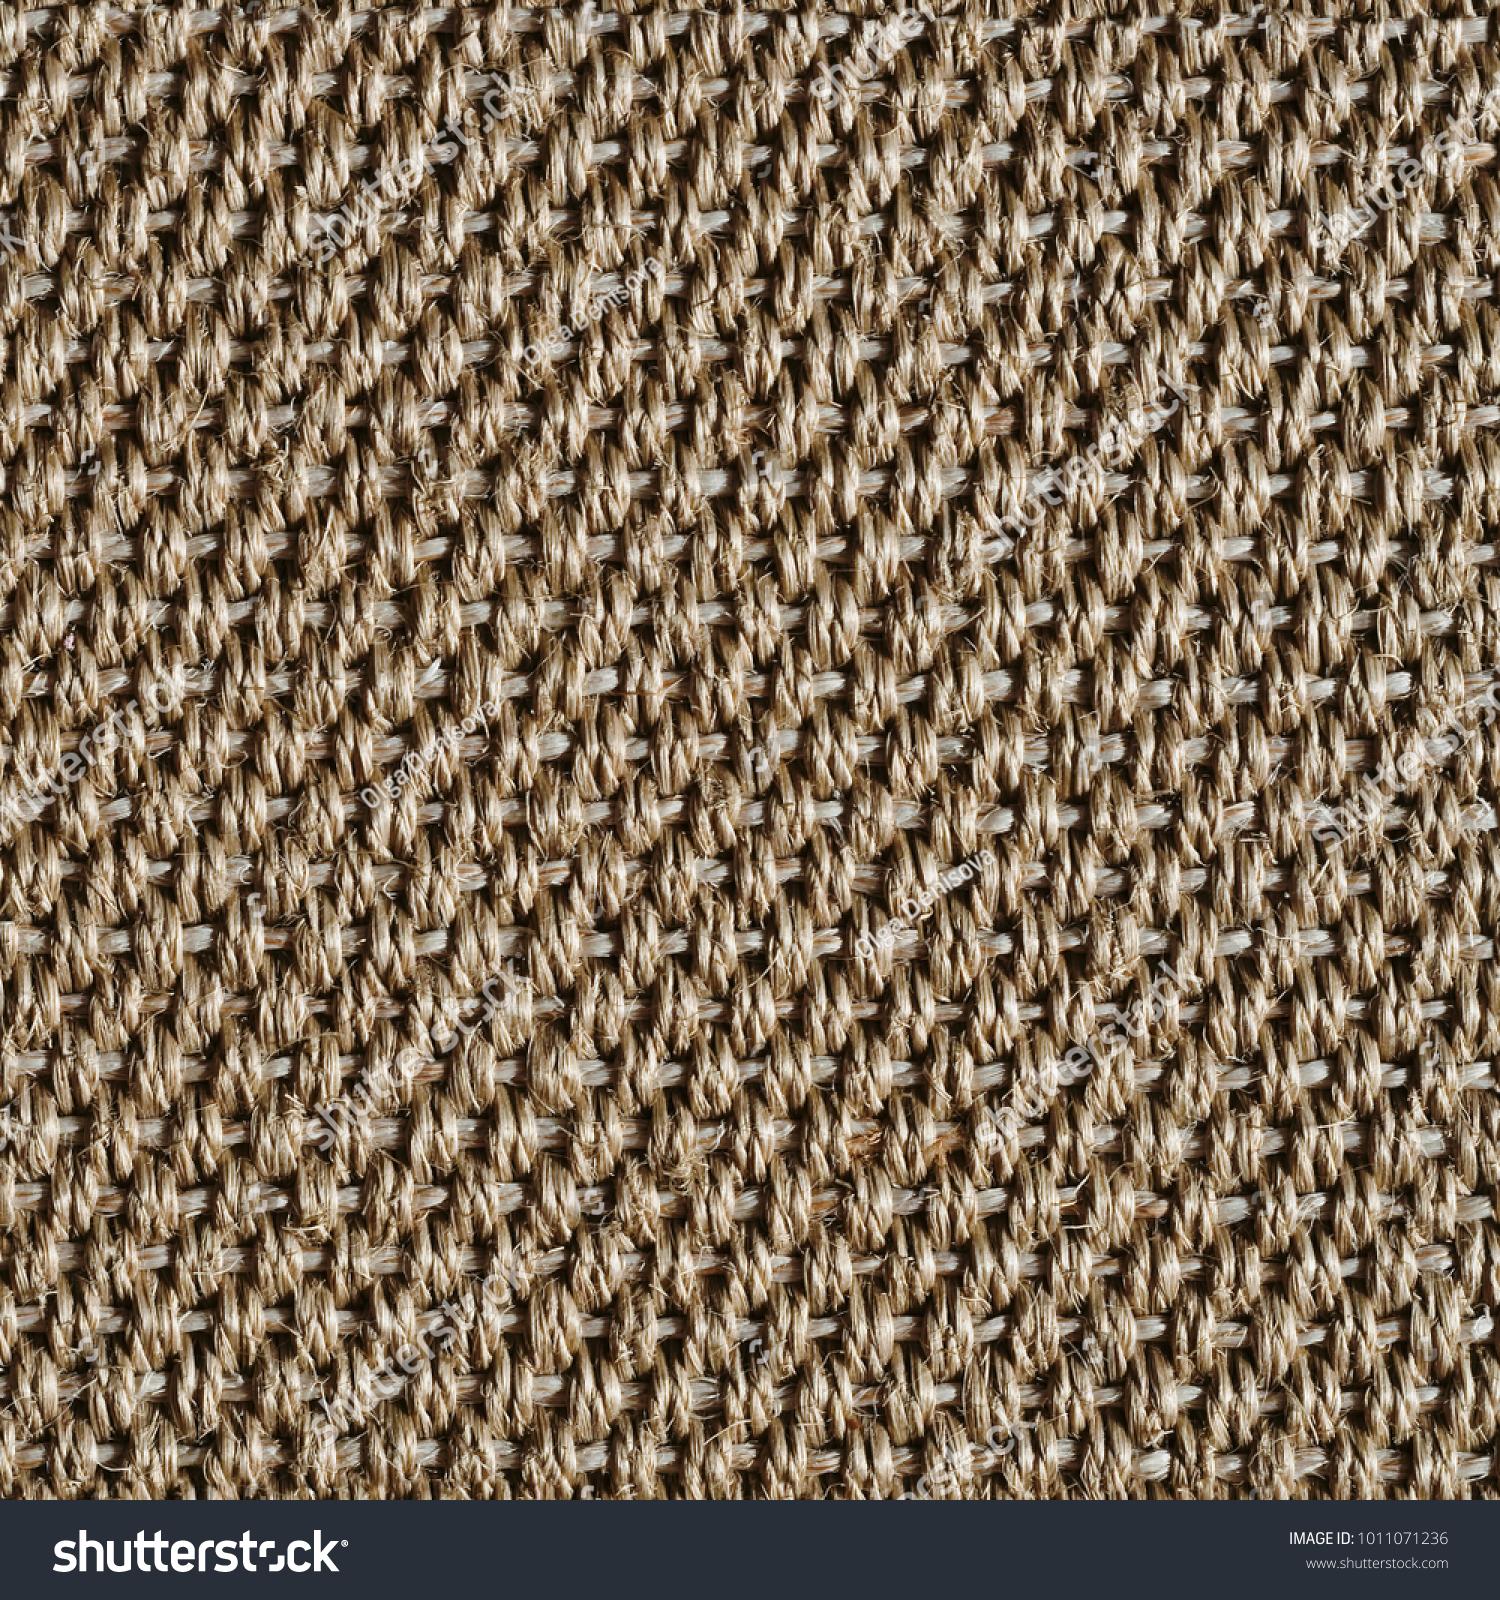 runner shang long collections sisal rugs scene mats mat dream